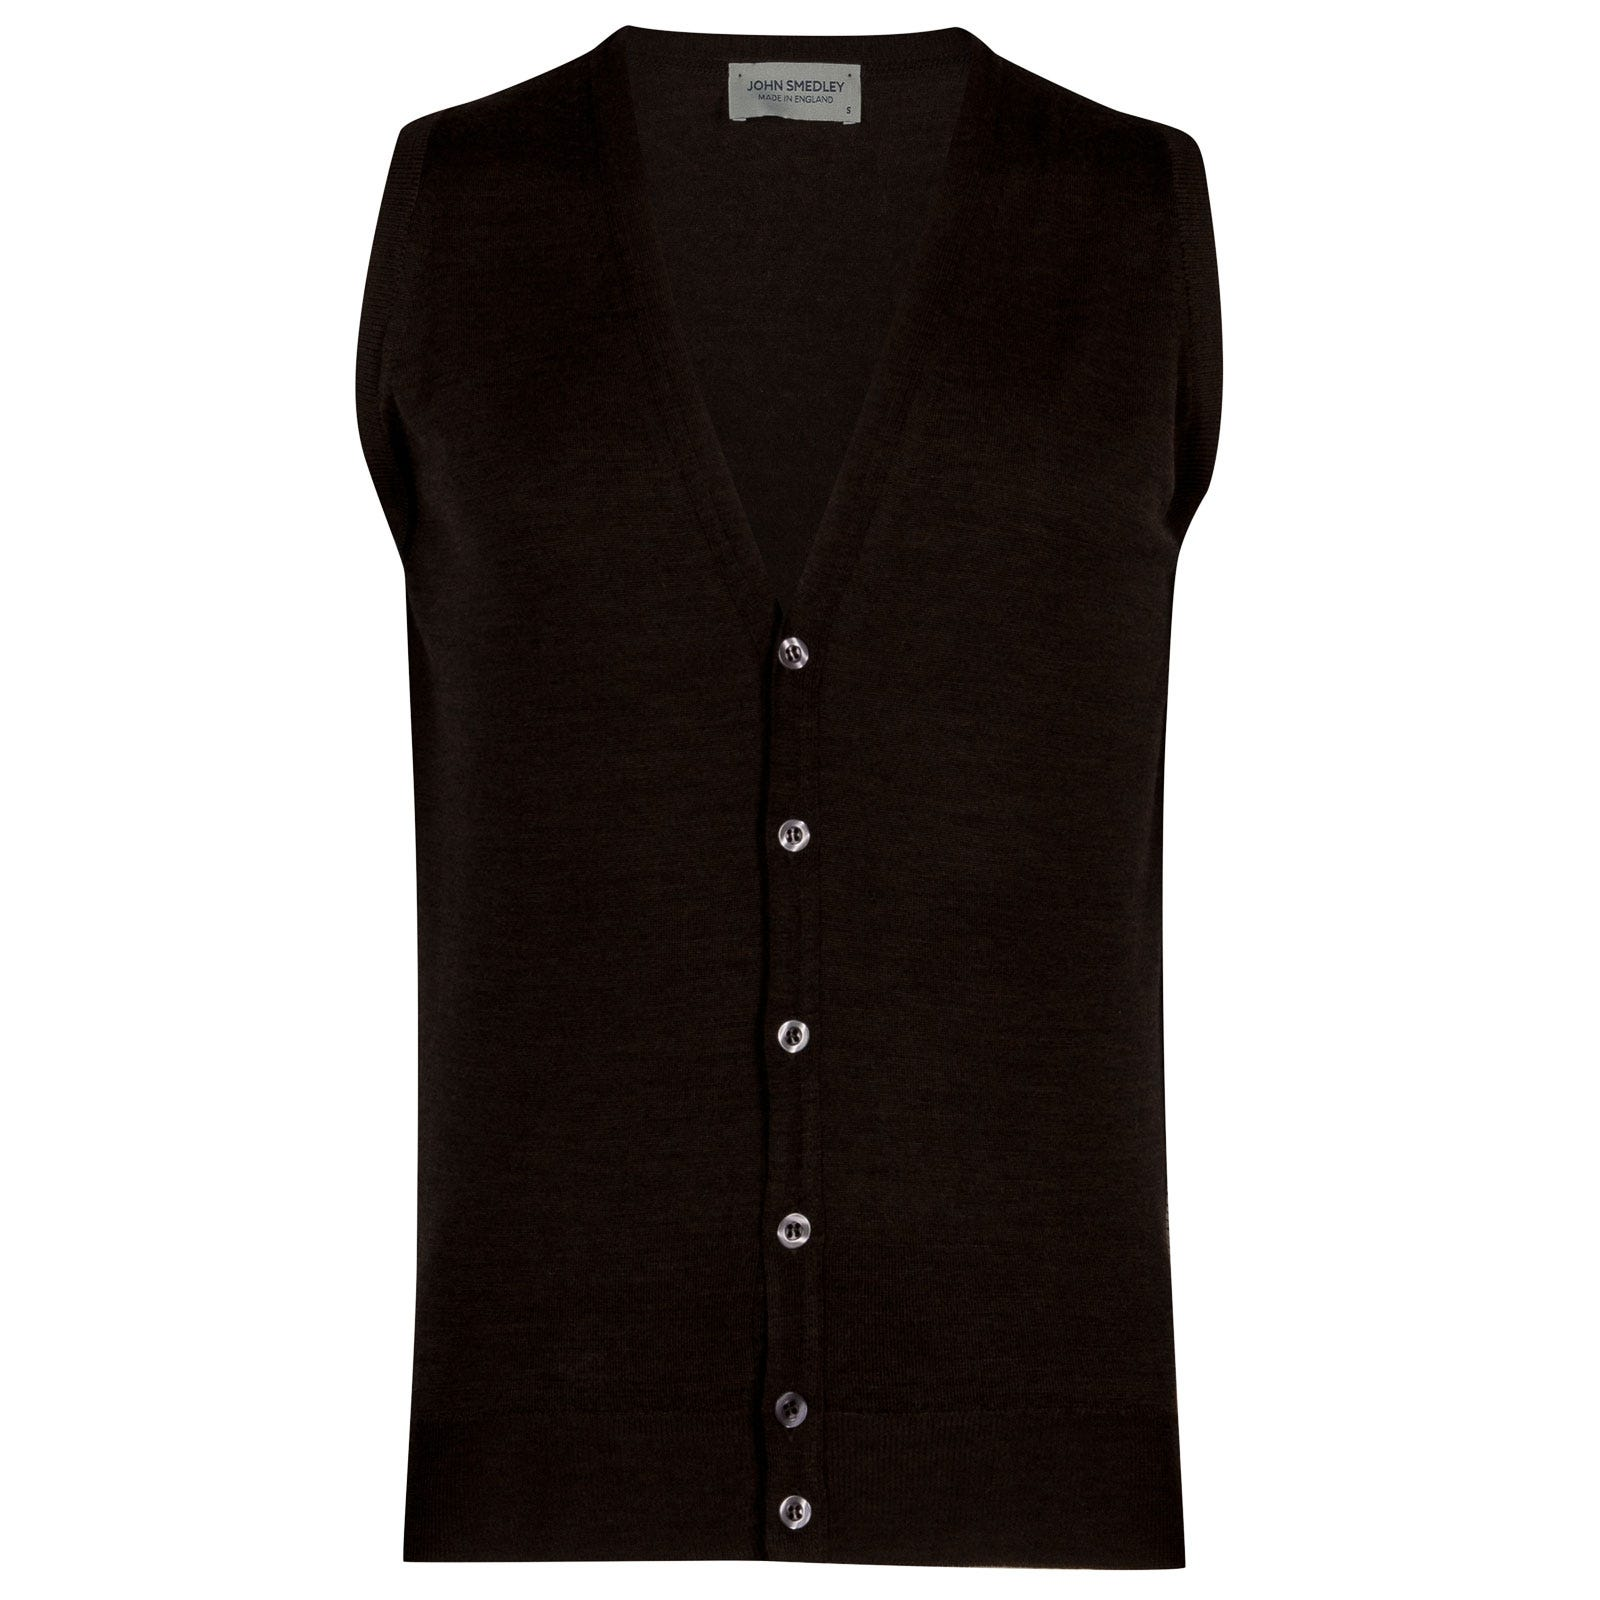 John Smedley HuntswoodMerino Wool Waistcoat in Chestnut-XXL